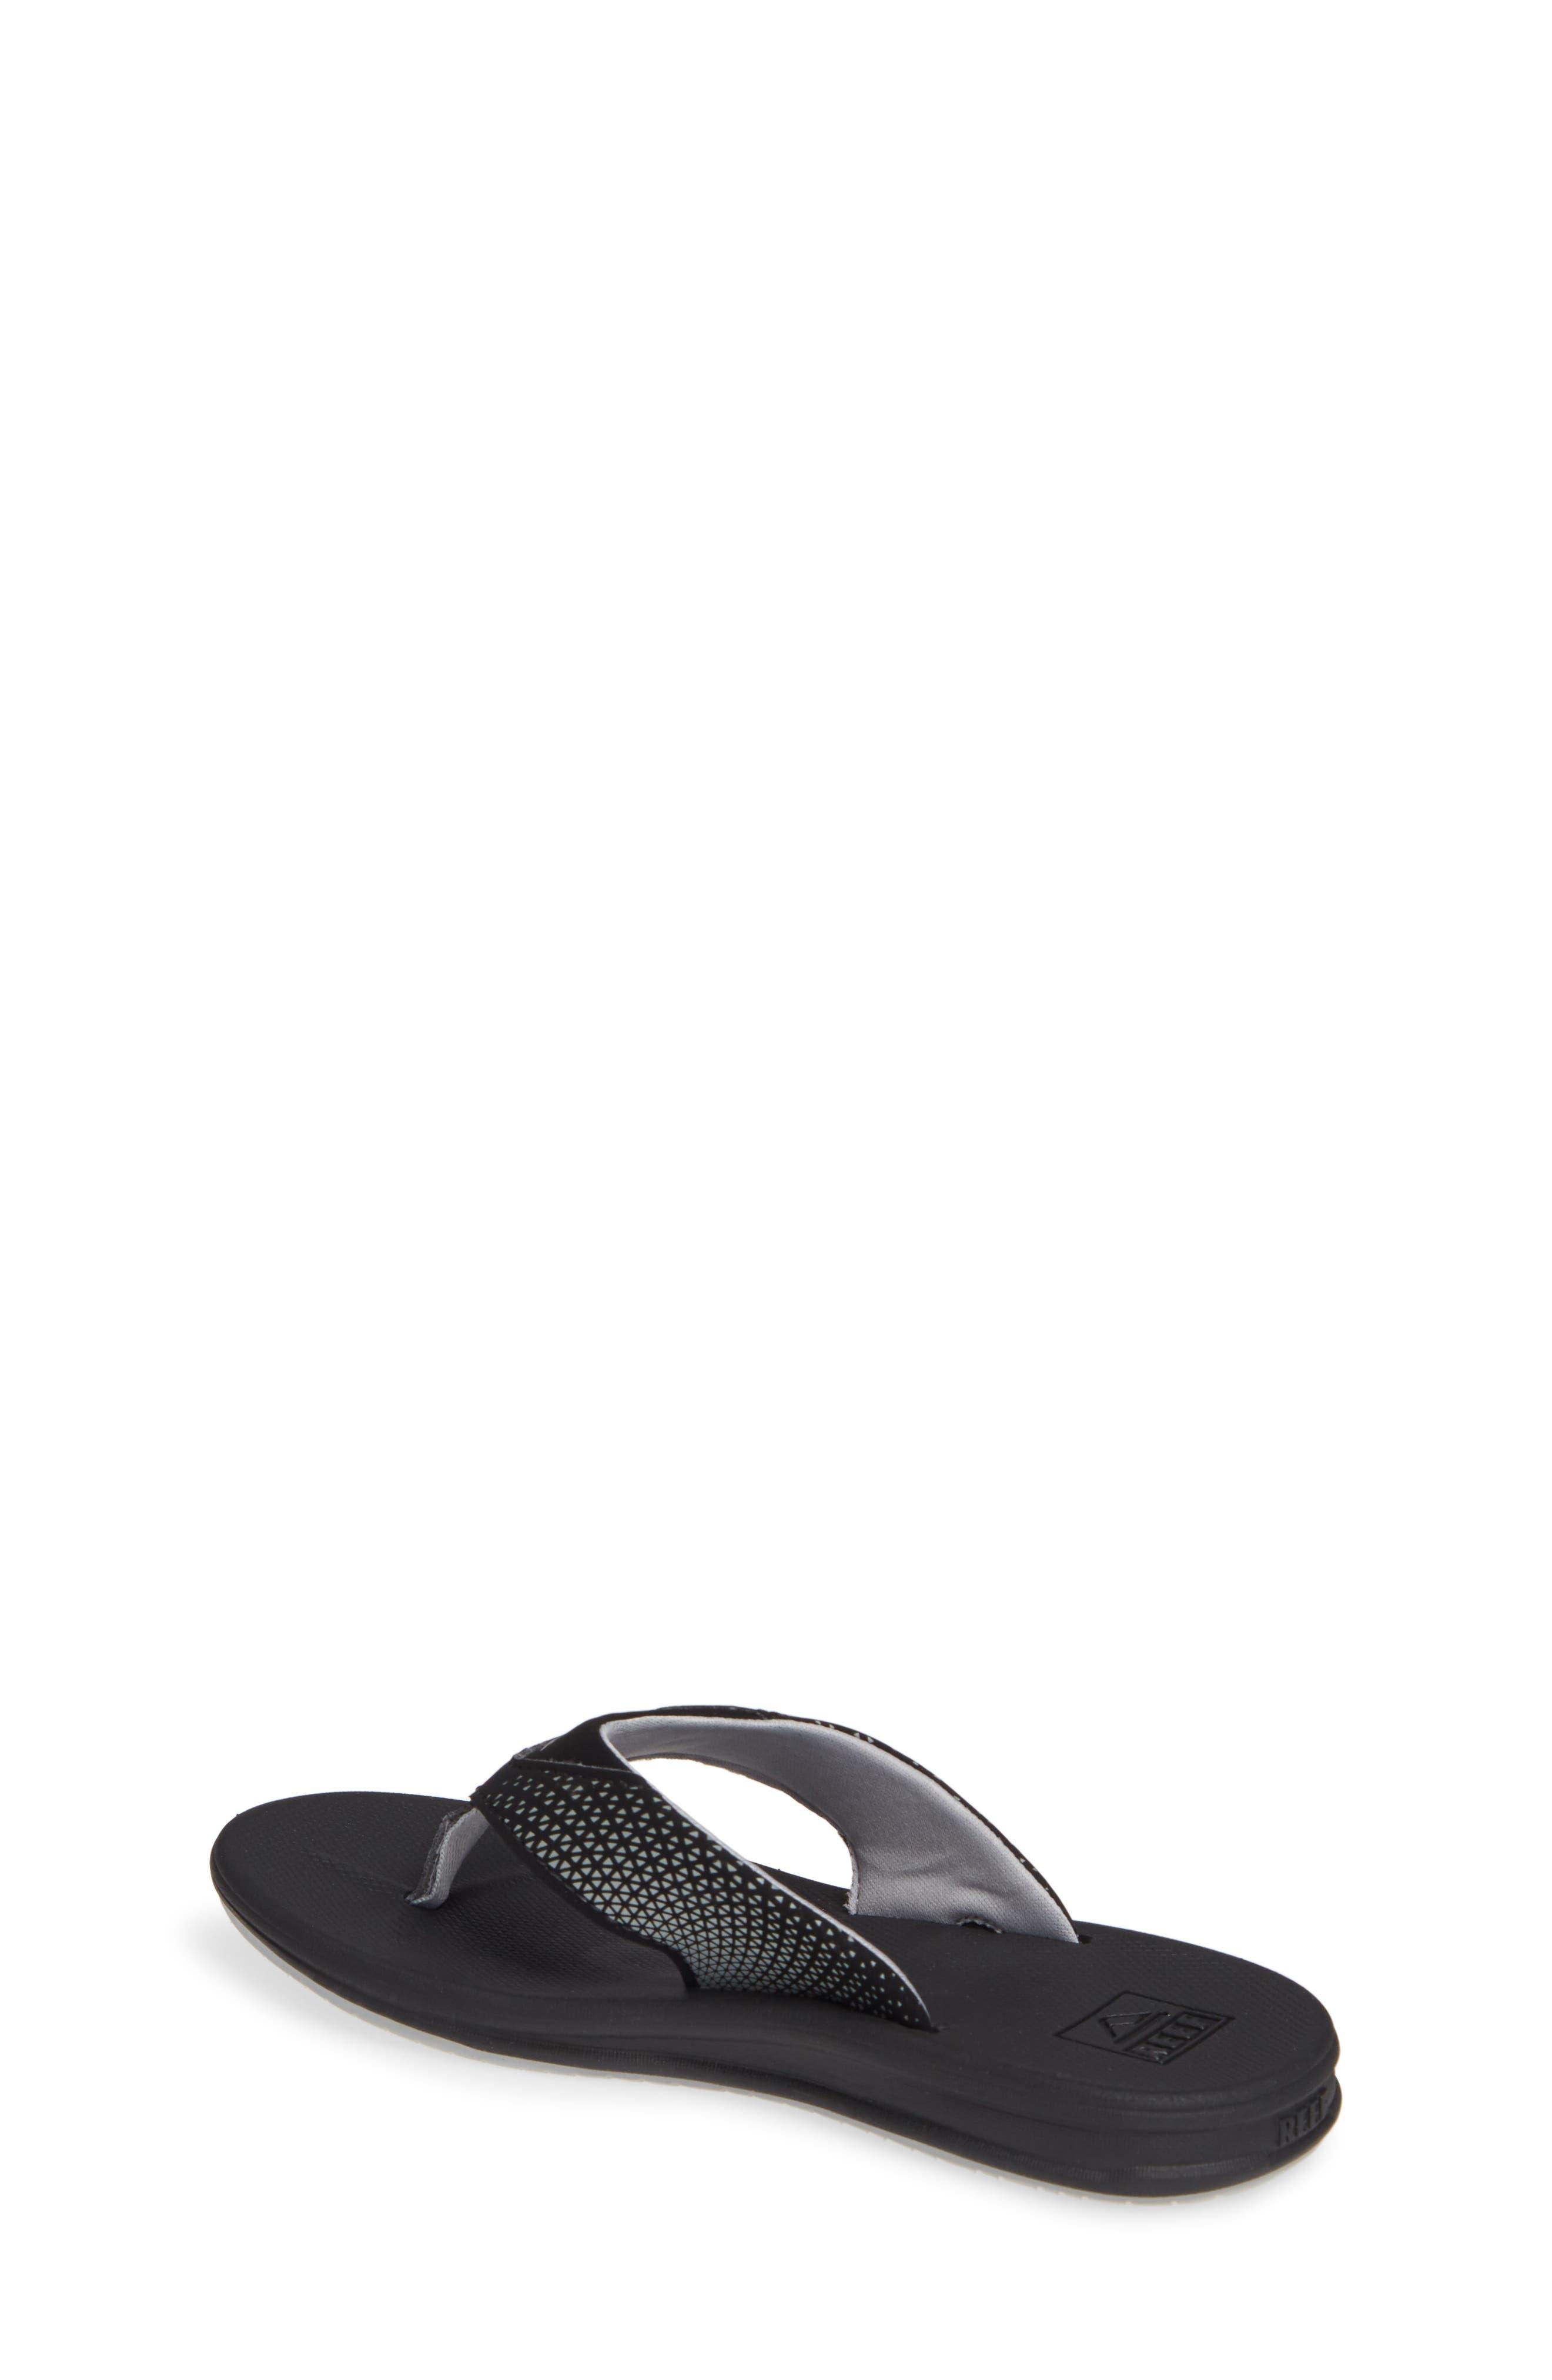 REEF, Grom Rover Water Friendly Sandal, Alternate thumbnail 2, color, BLACK